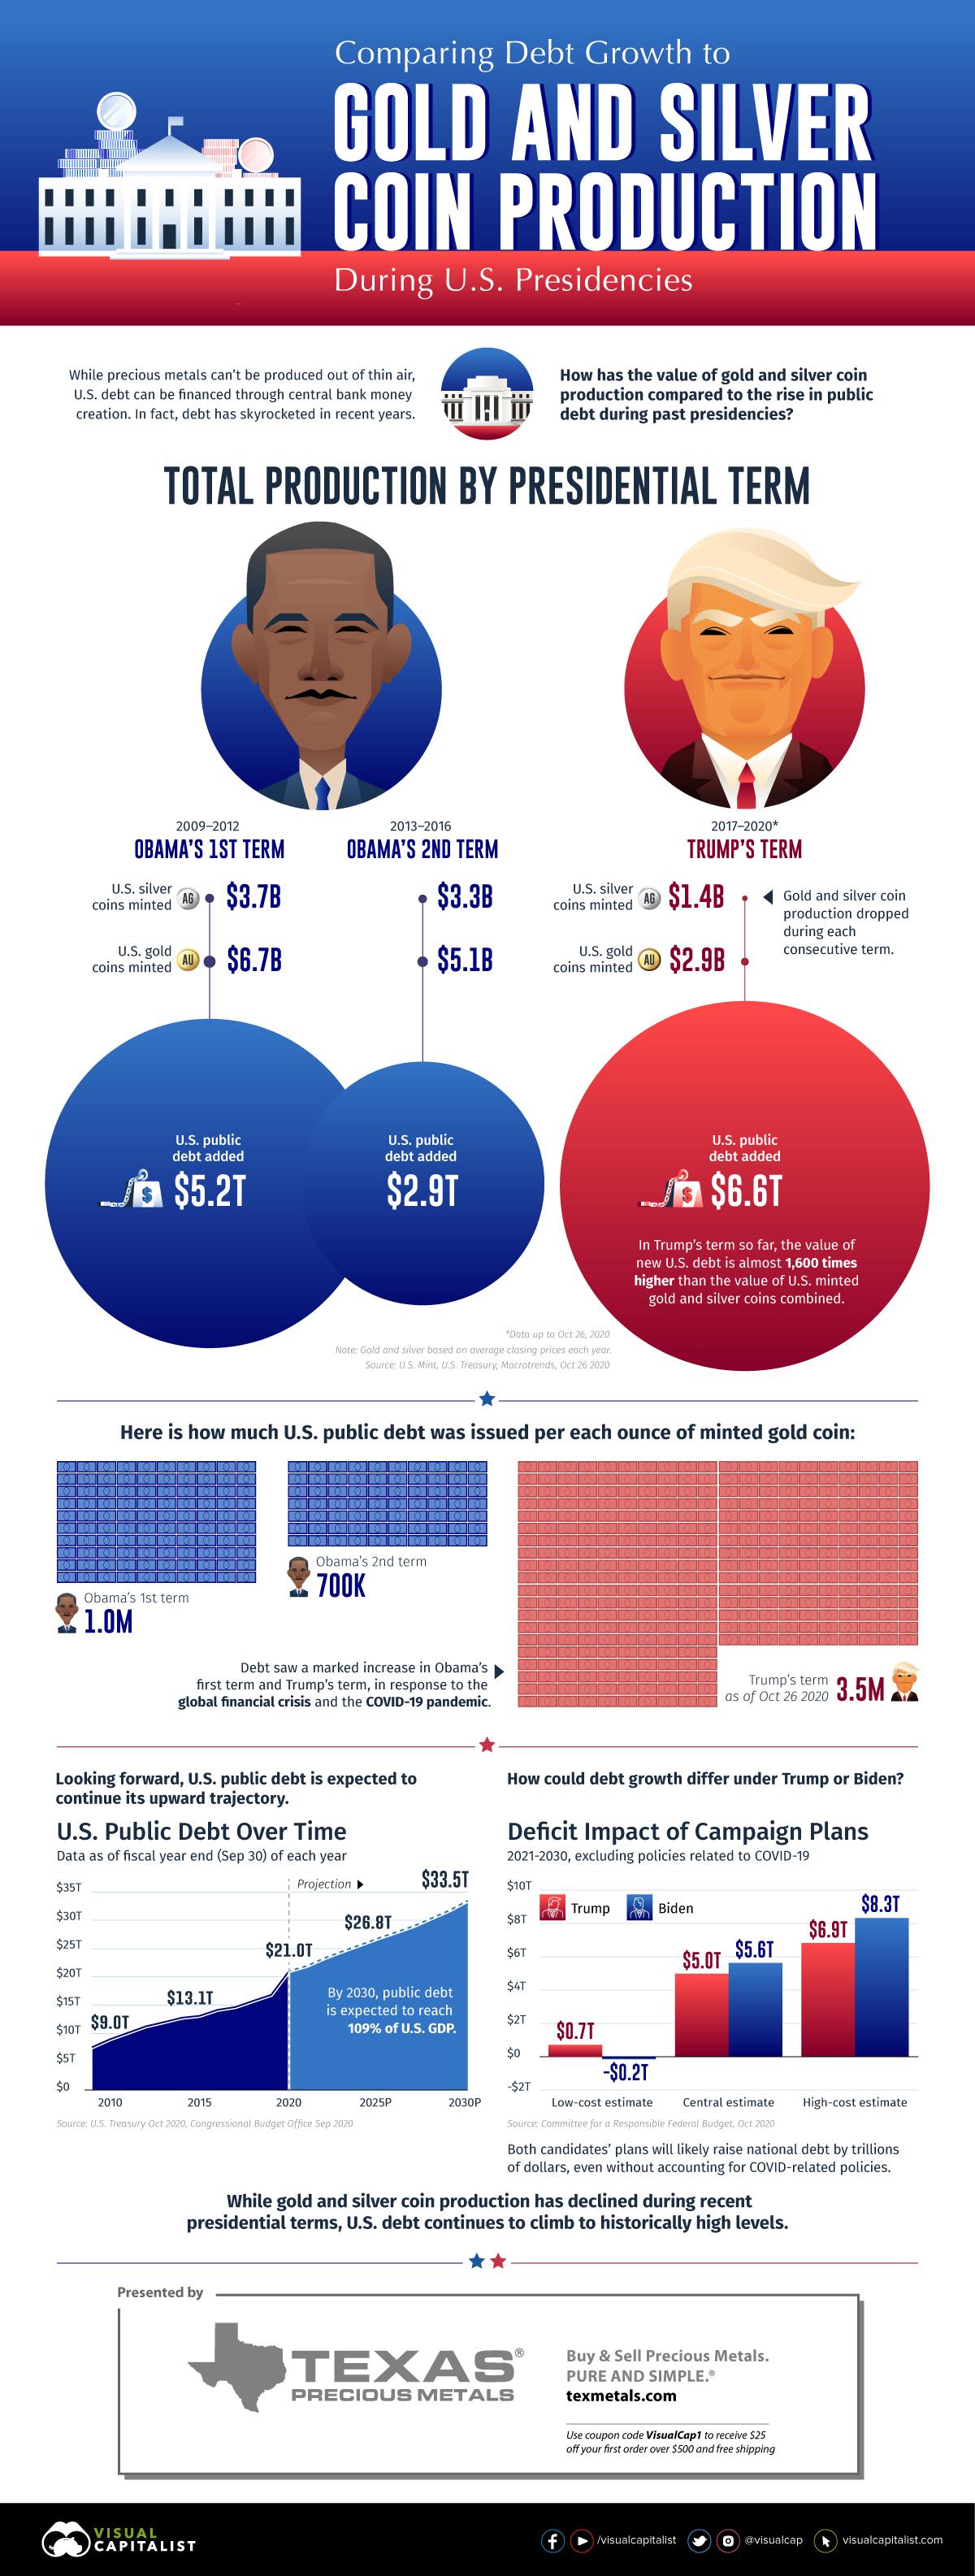 Comparing Recent U.S. Presidents: New Debt Added vs. Precious Metals Production